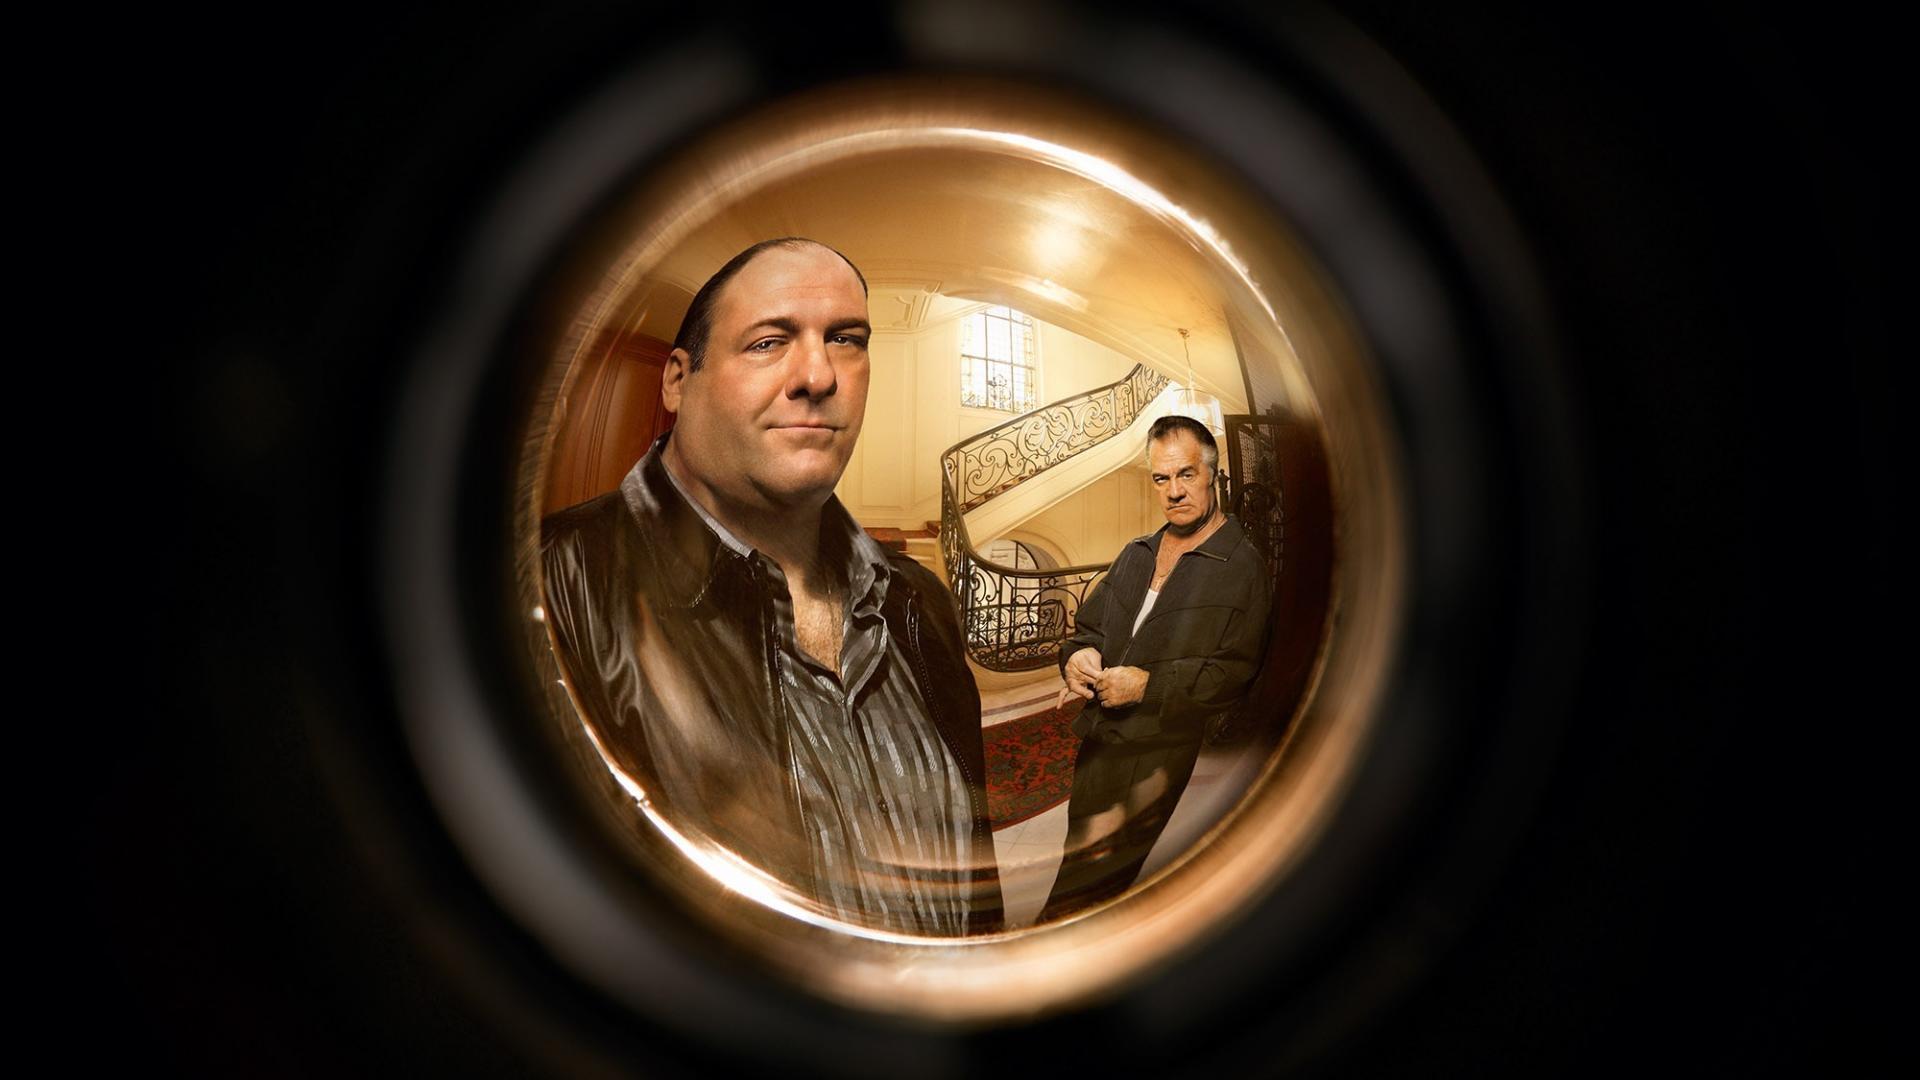 The Sopranos wallpaper 6